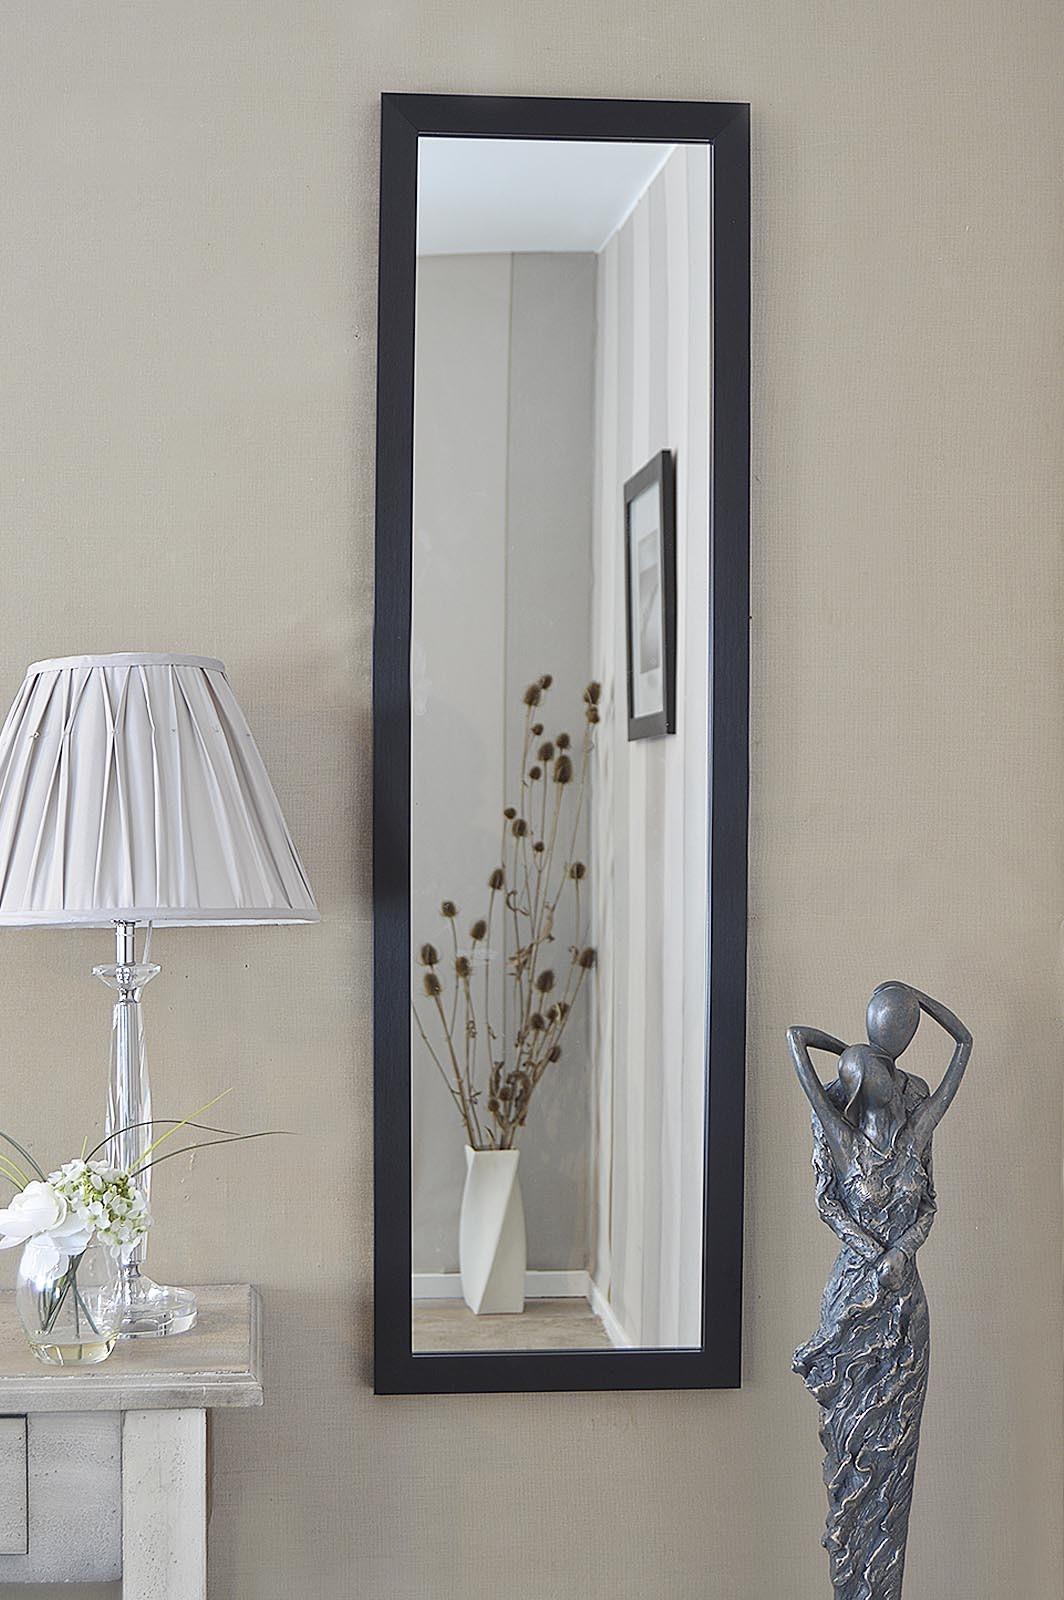 Big Mirror Floor Mirrors Saveemail 28 Elegant Floor Mirror In Large Black Mirrors (Image 1 of 15)